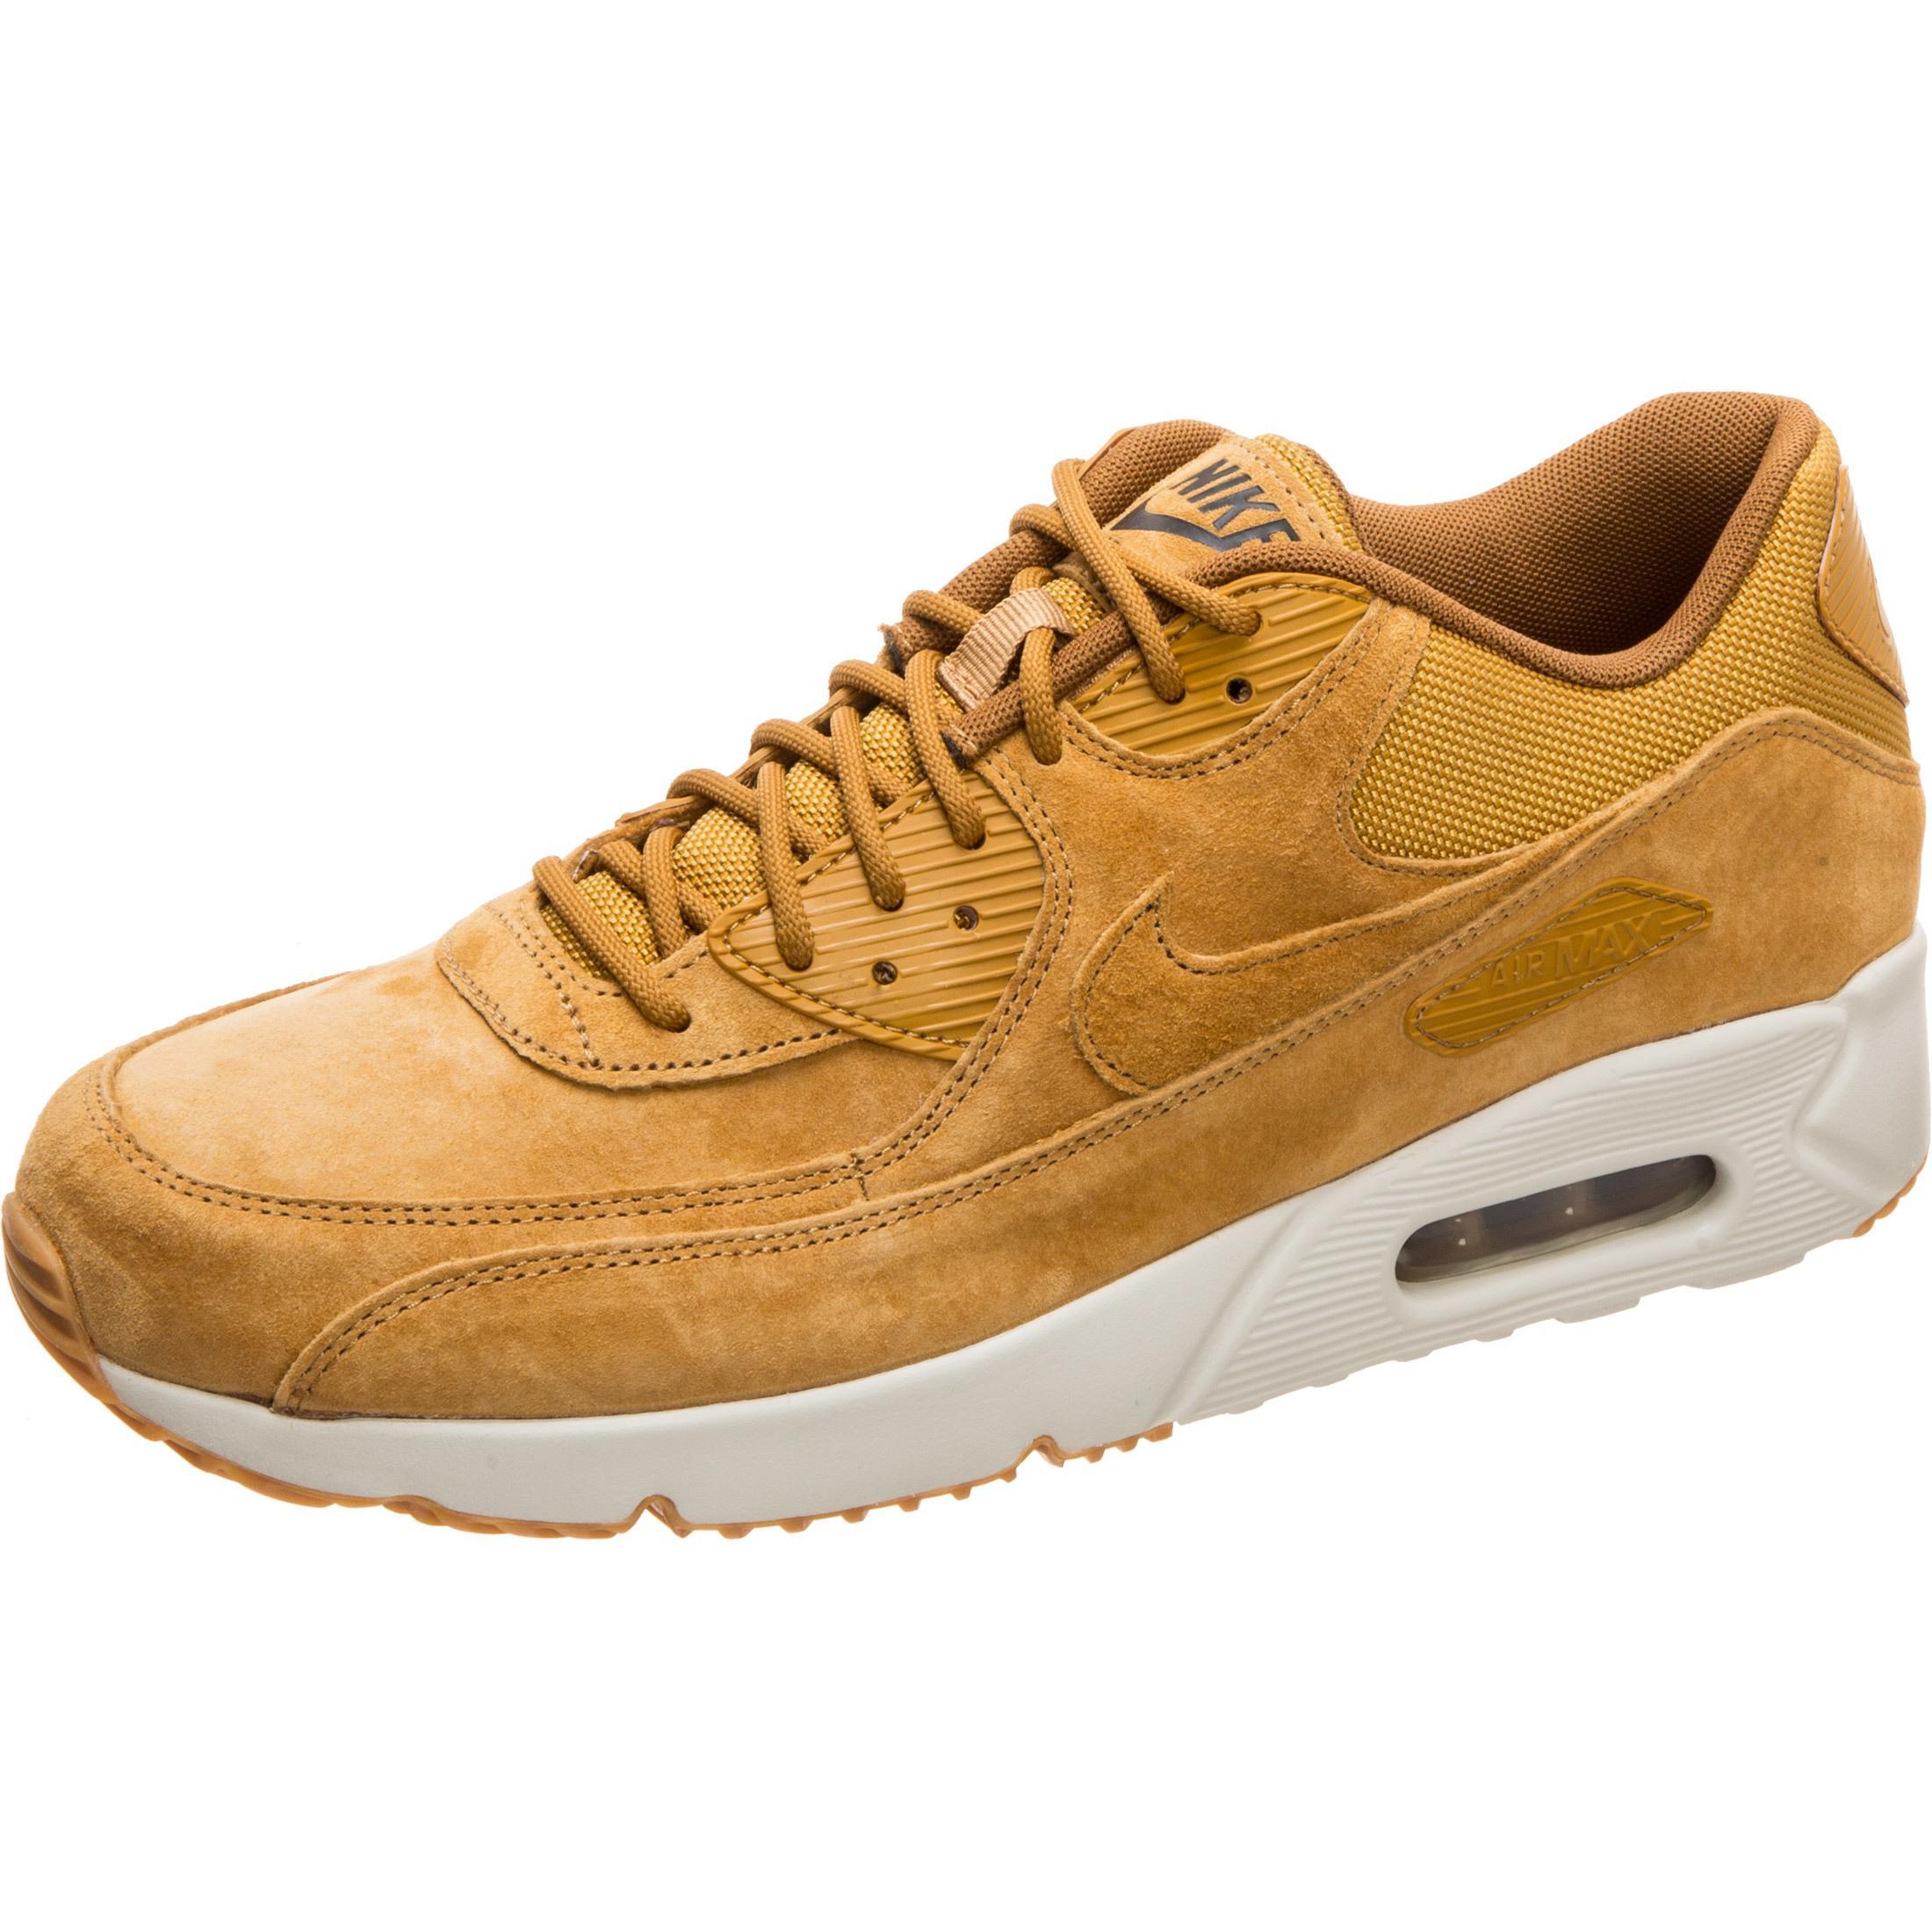 nike sportswear Turnschuhe air max 90 leather